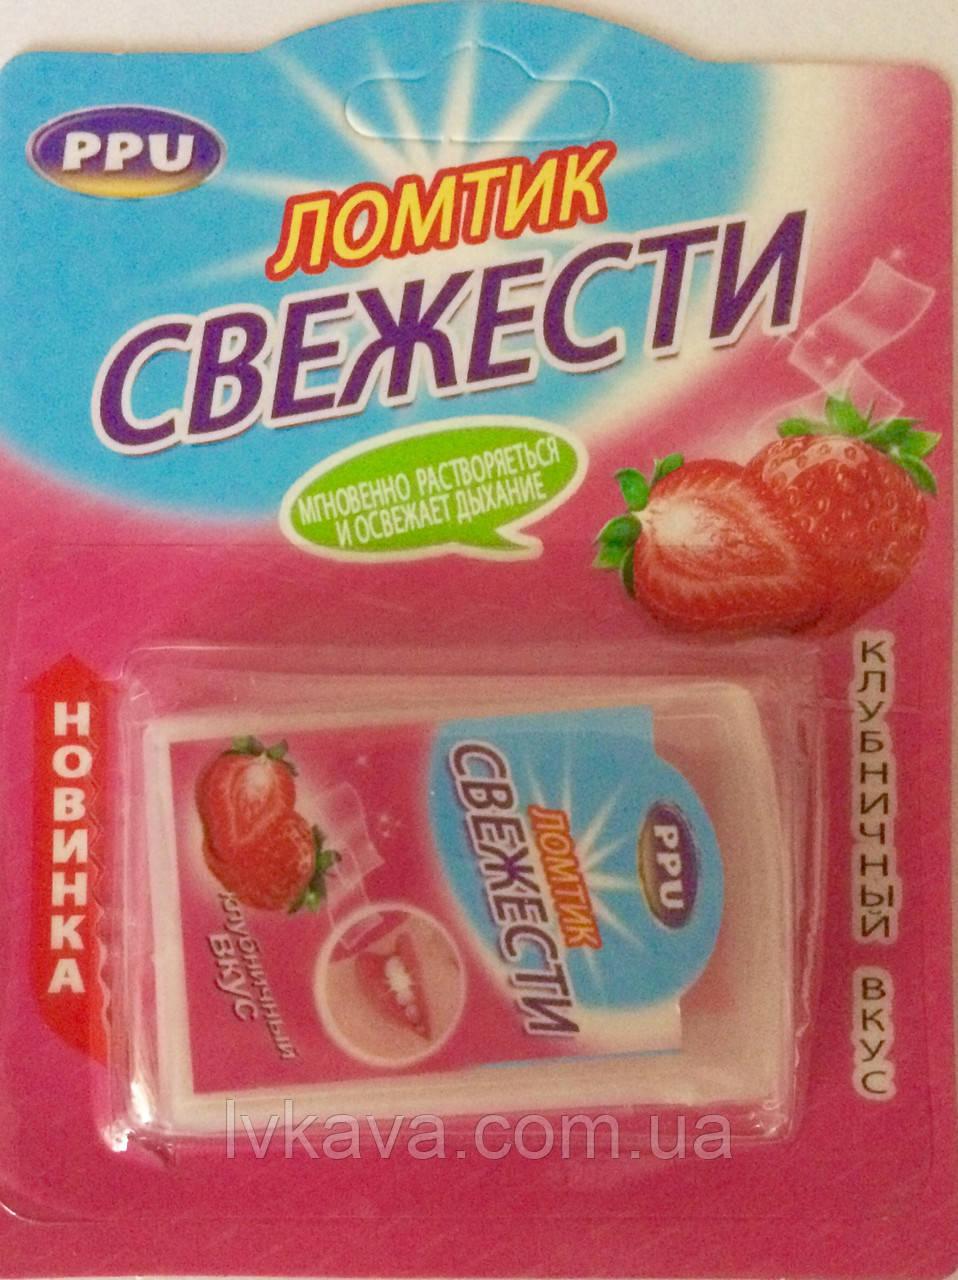 Освежающая пластинка Ломтик свежести клубника PPU , 8 гр